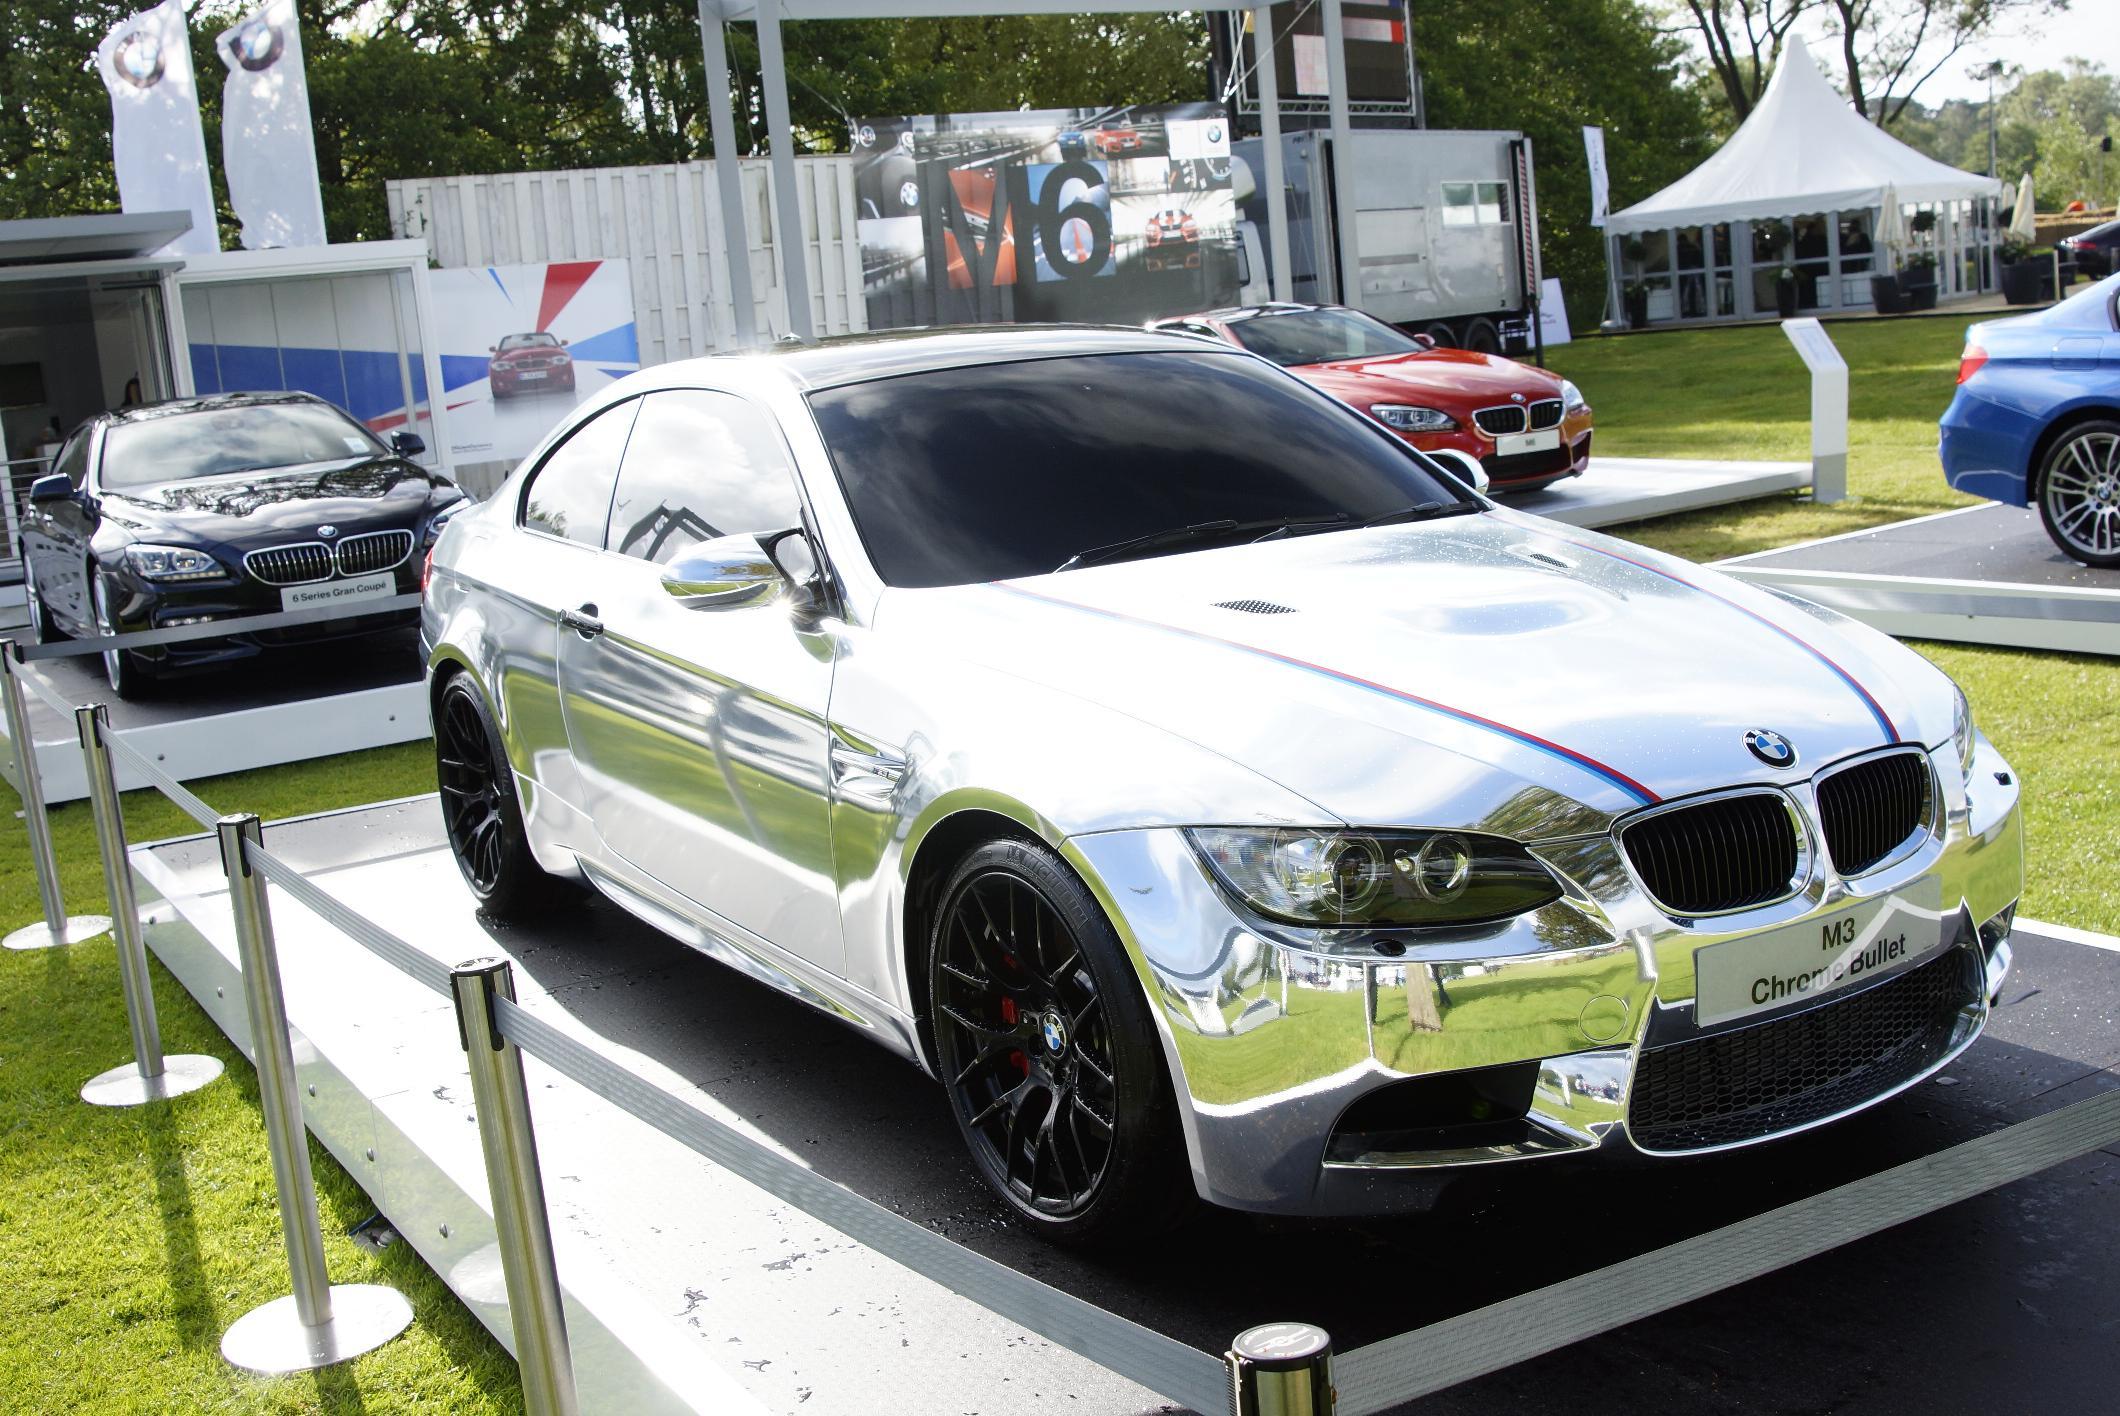 BMW M3 Chrome Bullet Cholmondeley 2012